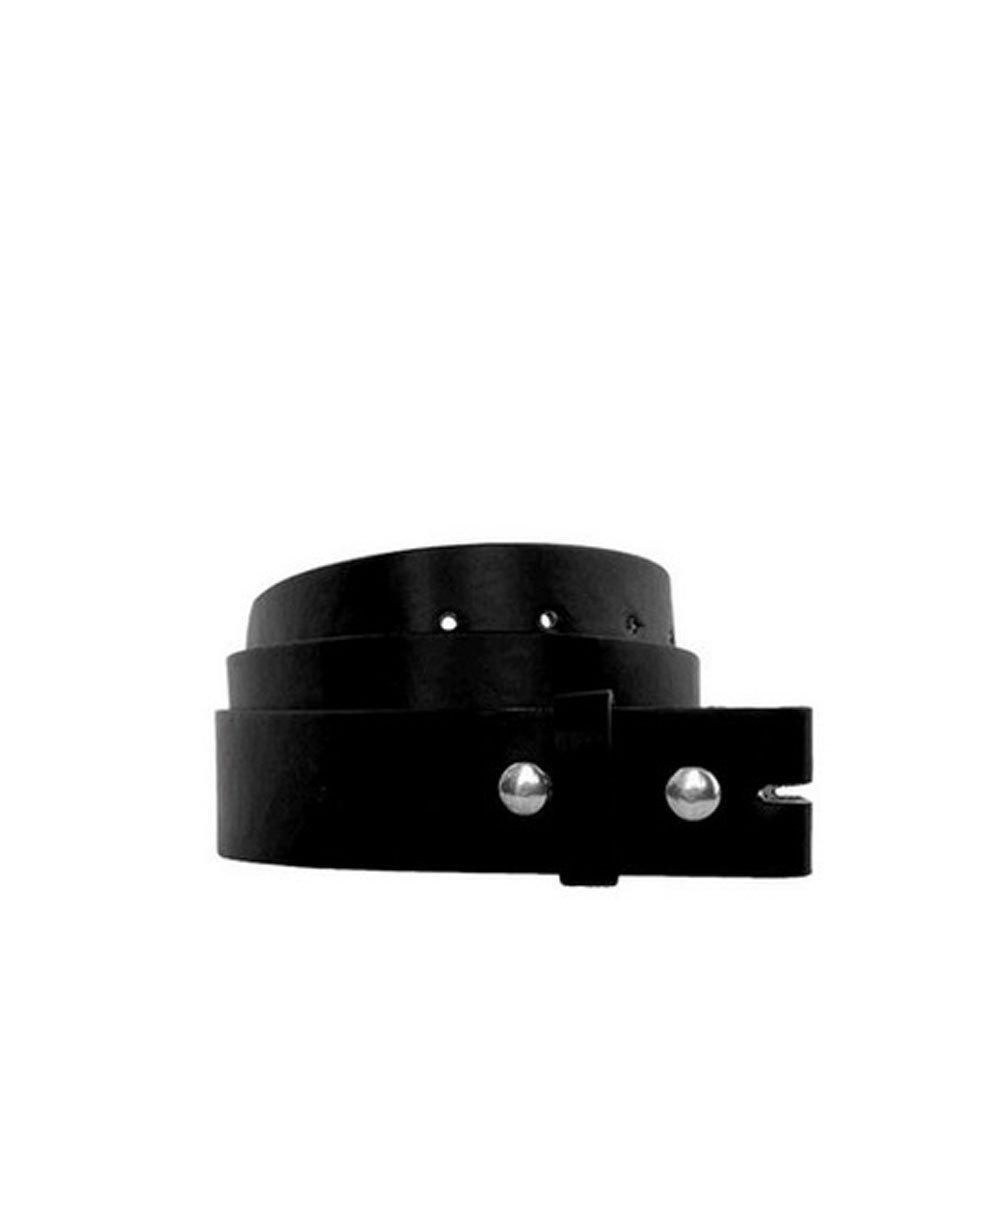 All Color Leather Belt For All Buckles, LARGE, BLACK